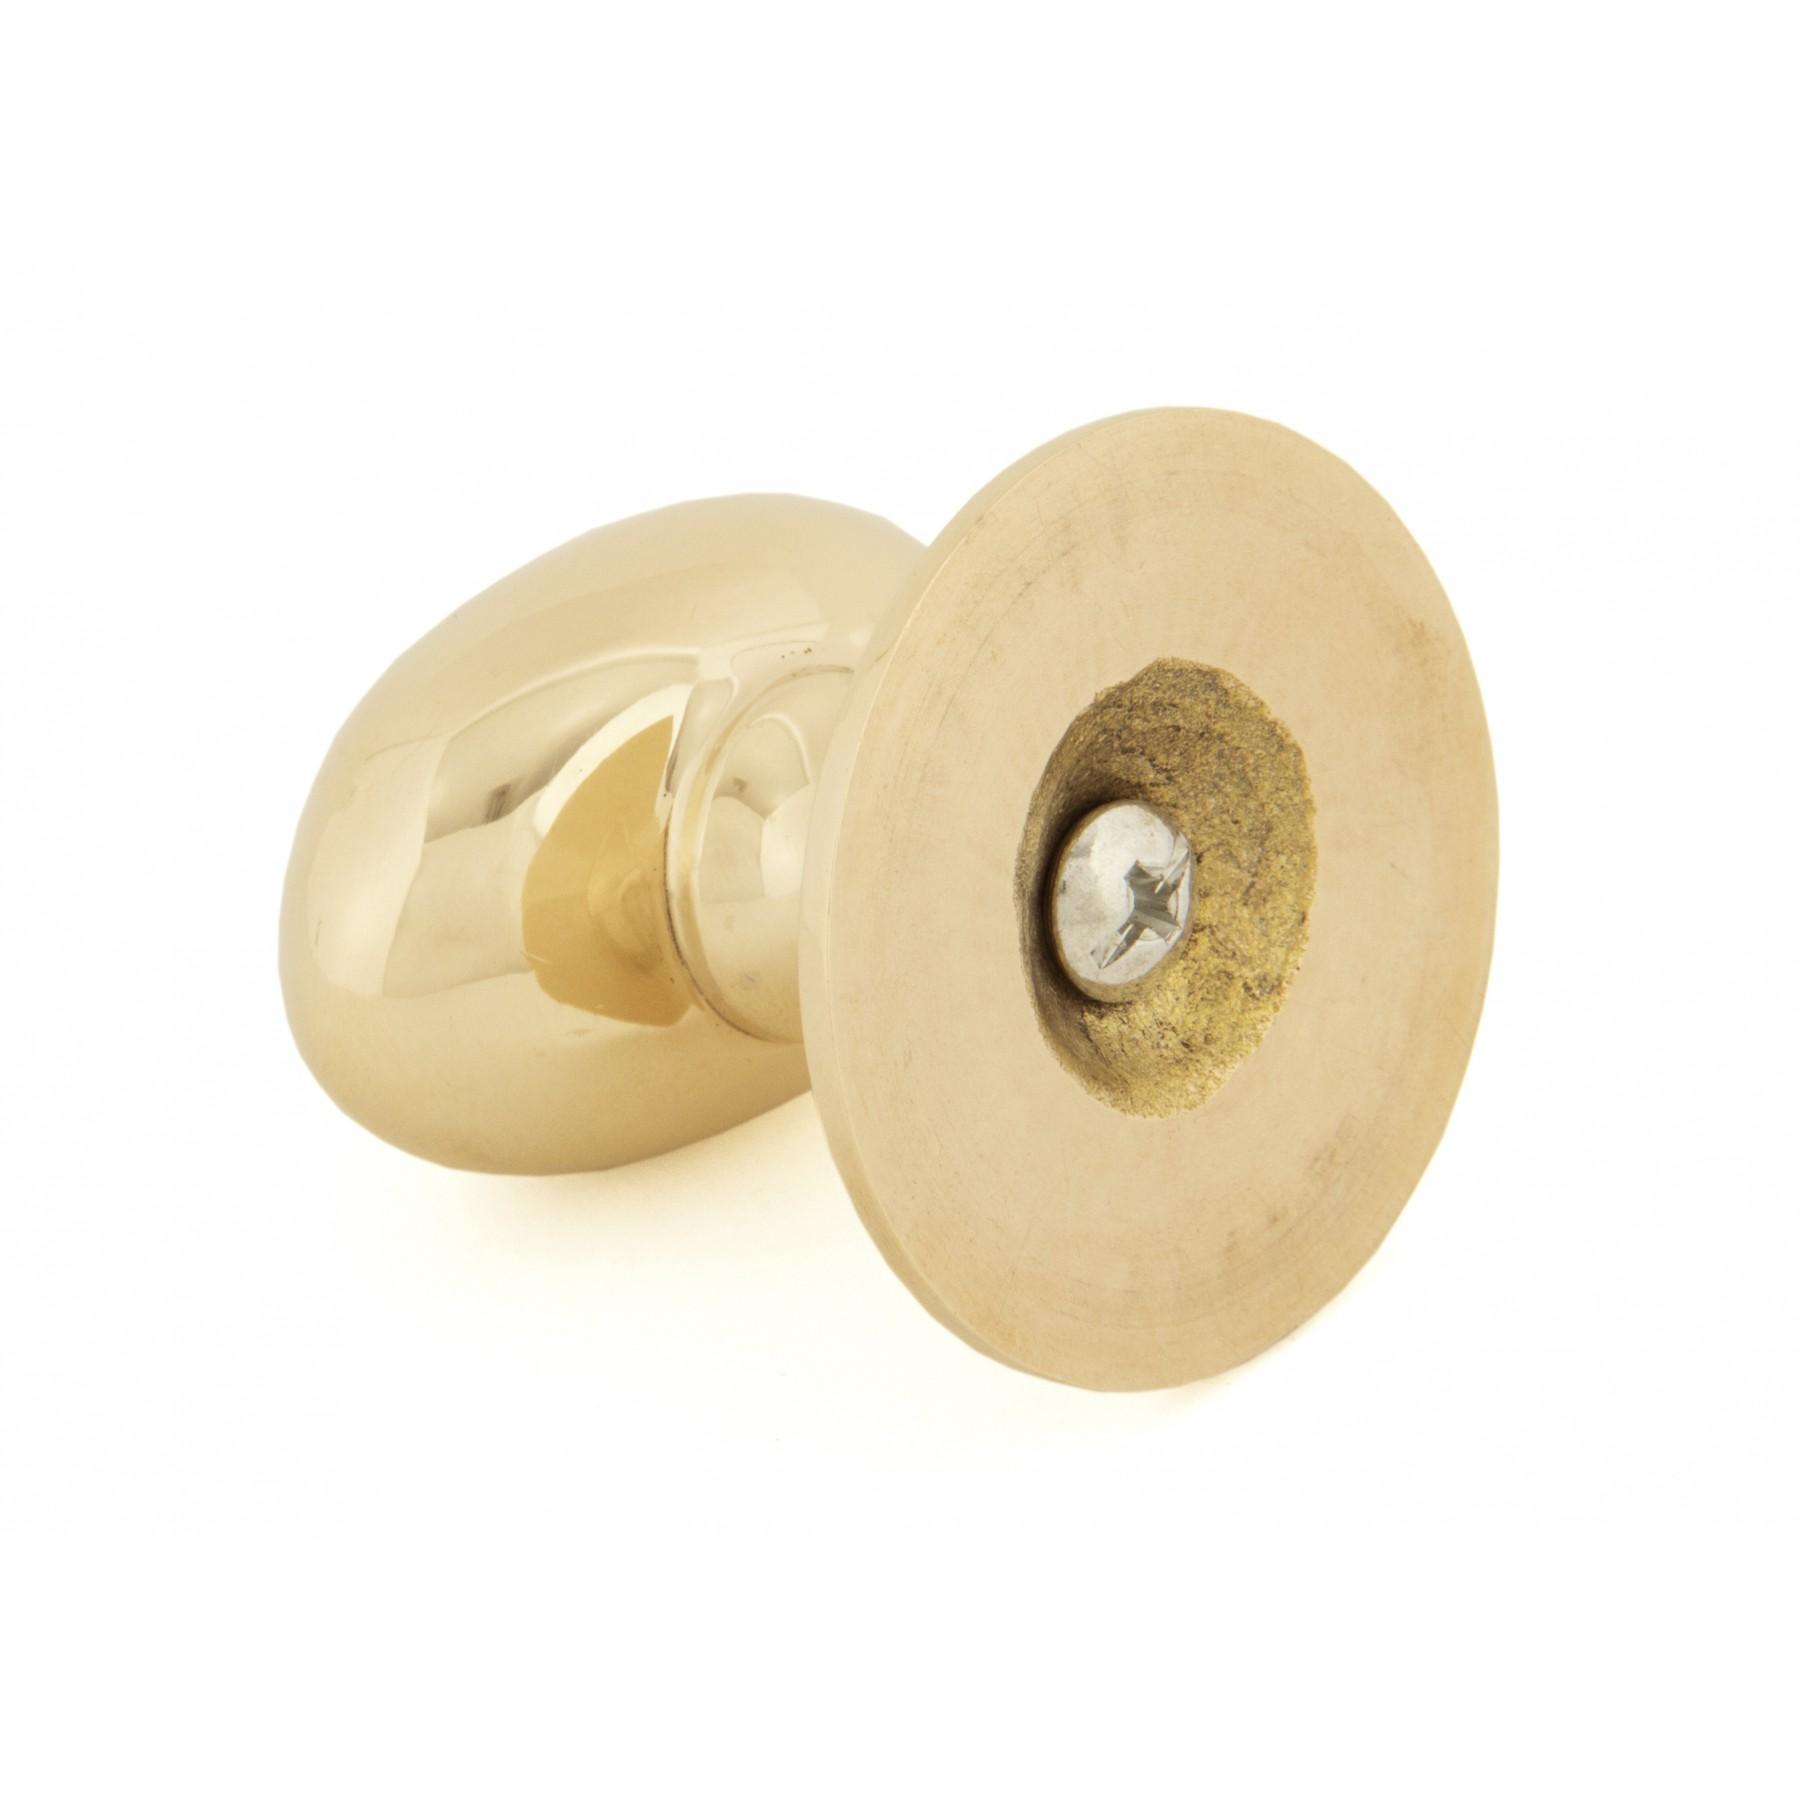 Large Polished Brass Oval Cabinet Knob